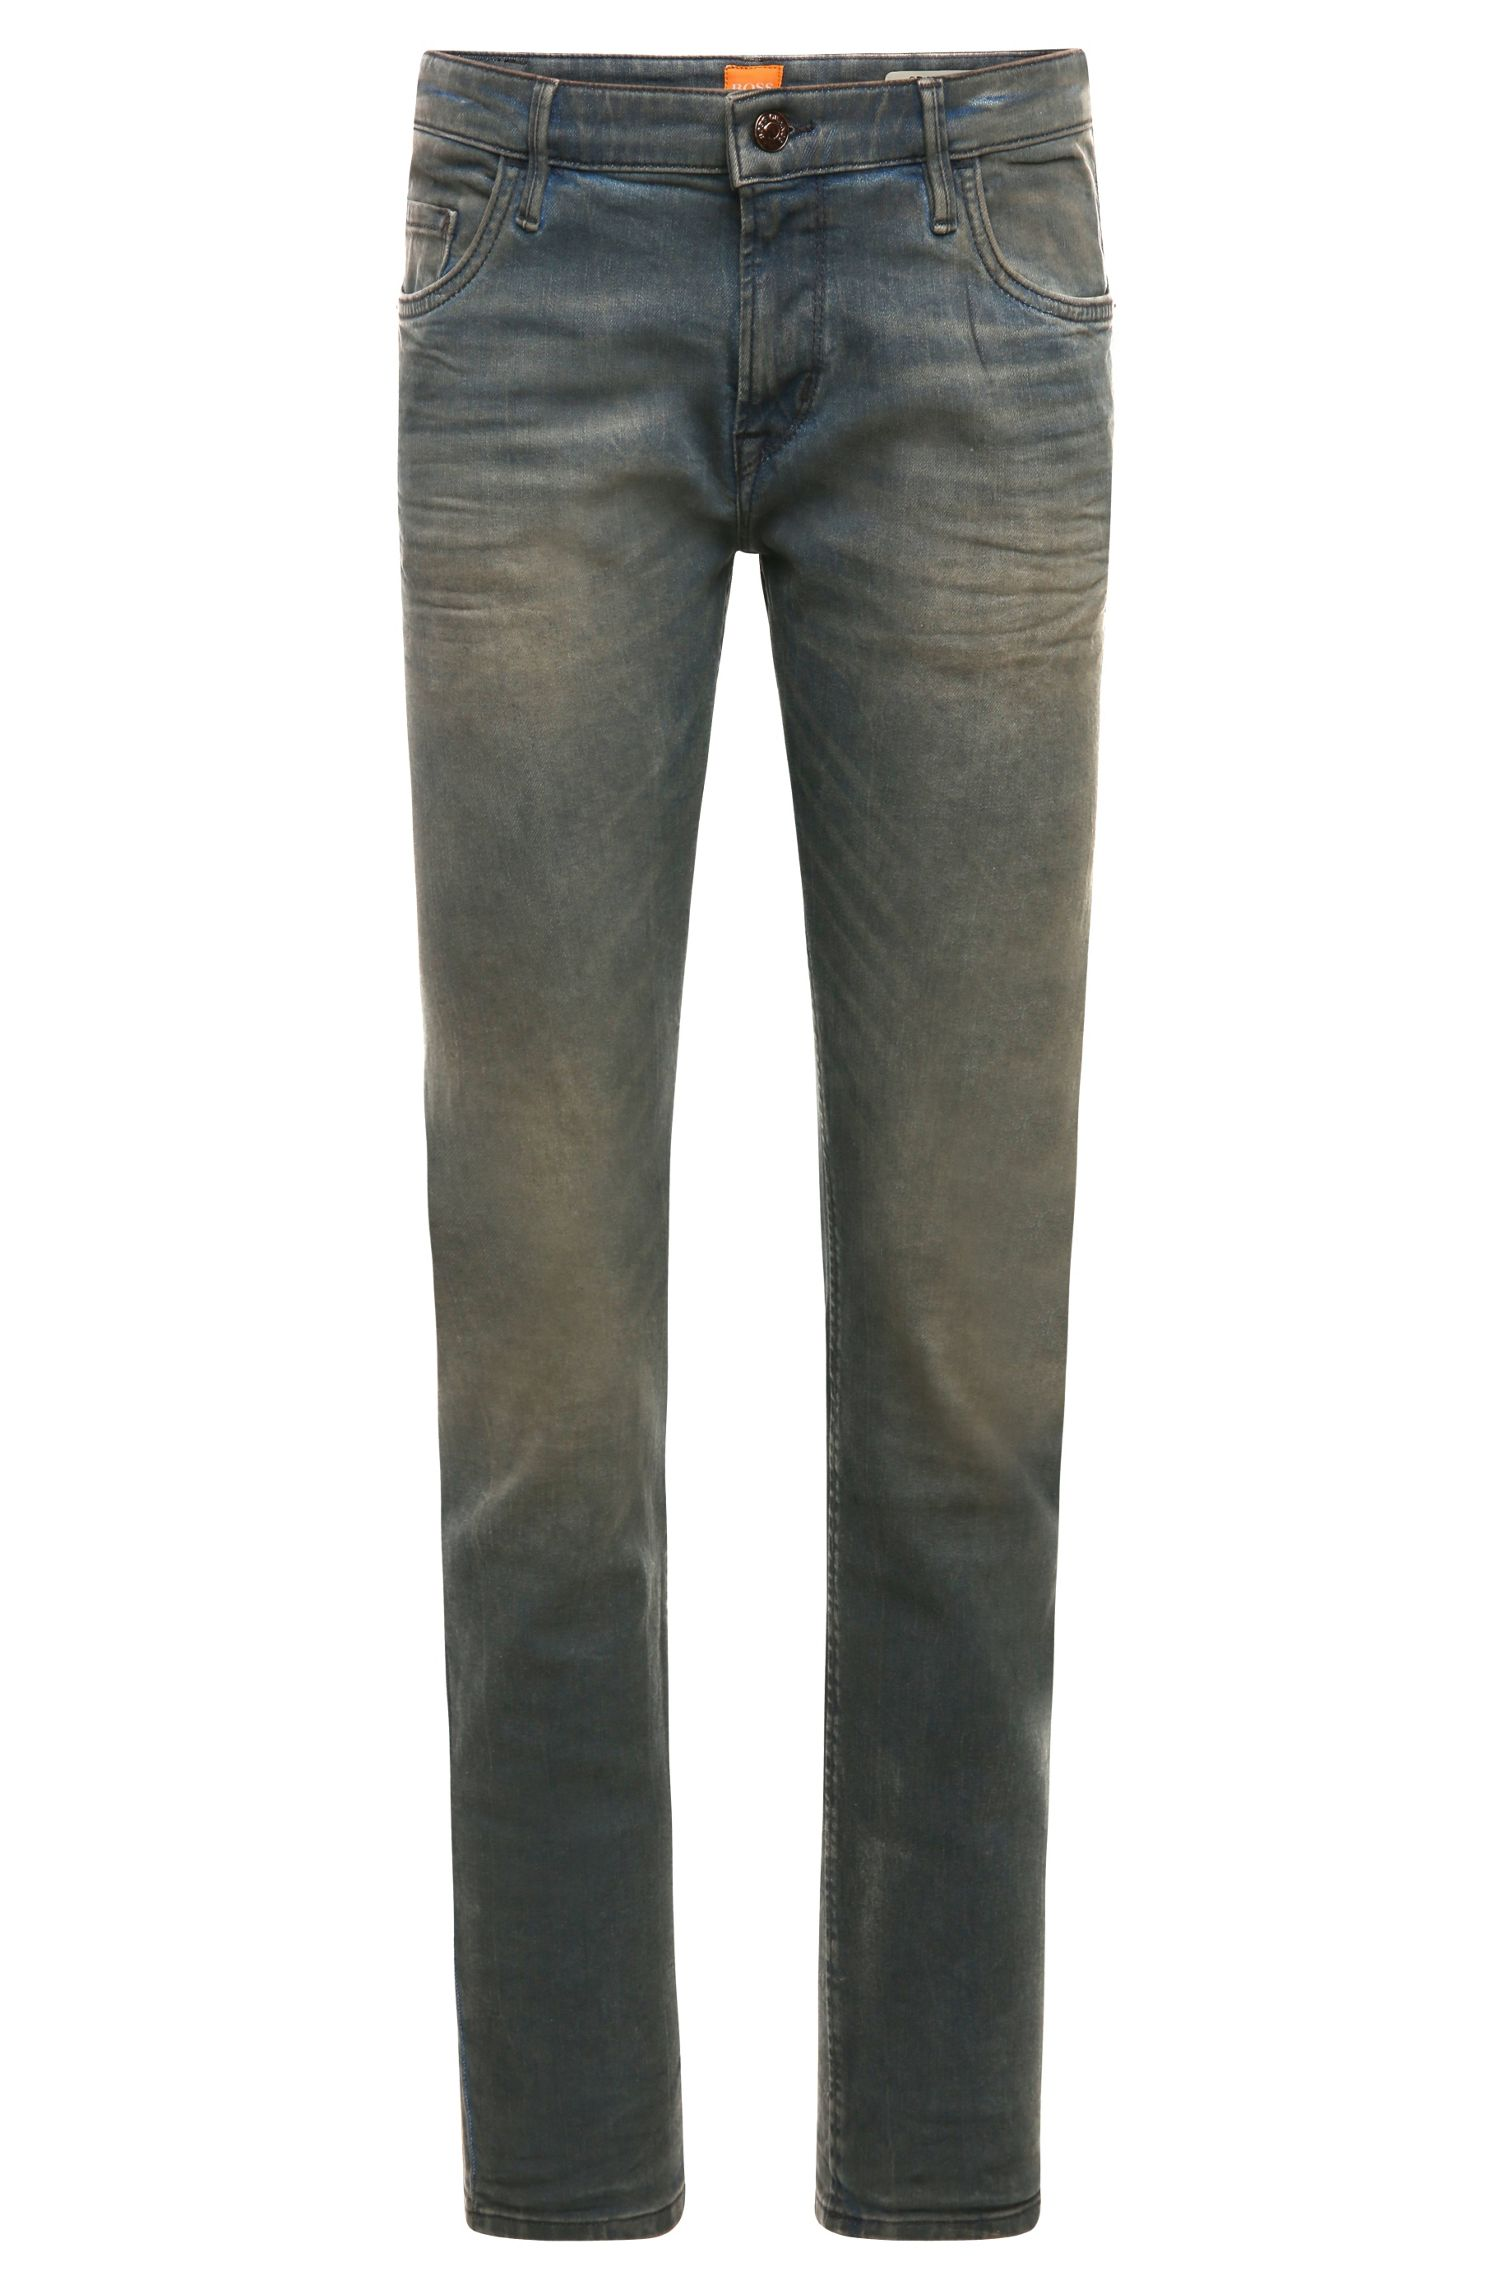 'Orange71'   Extra Slim Fit, 12.75 oz Stretch Cotton Blend Jeans